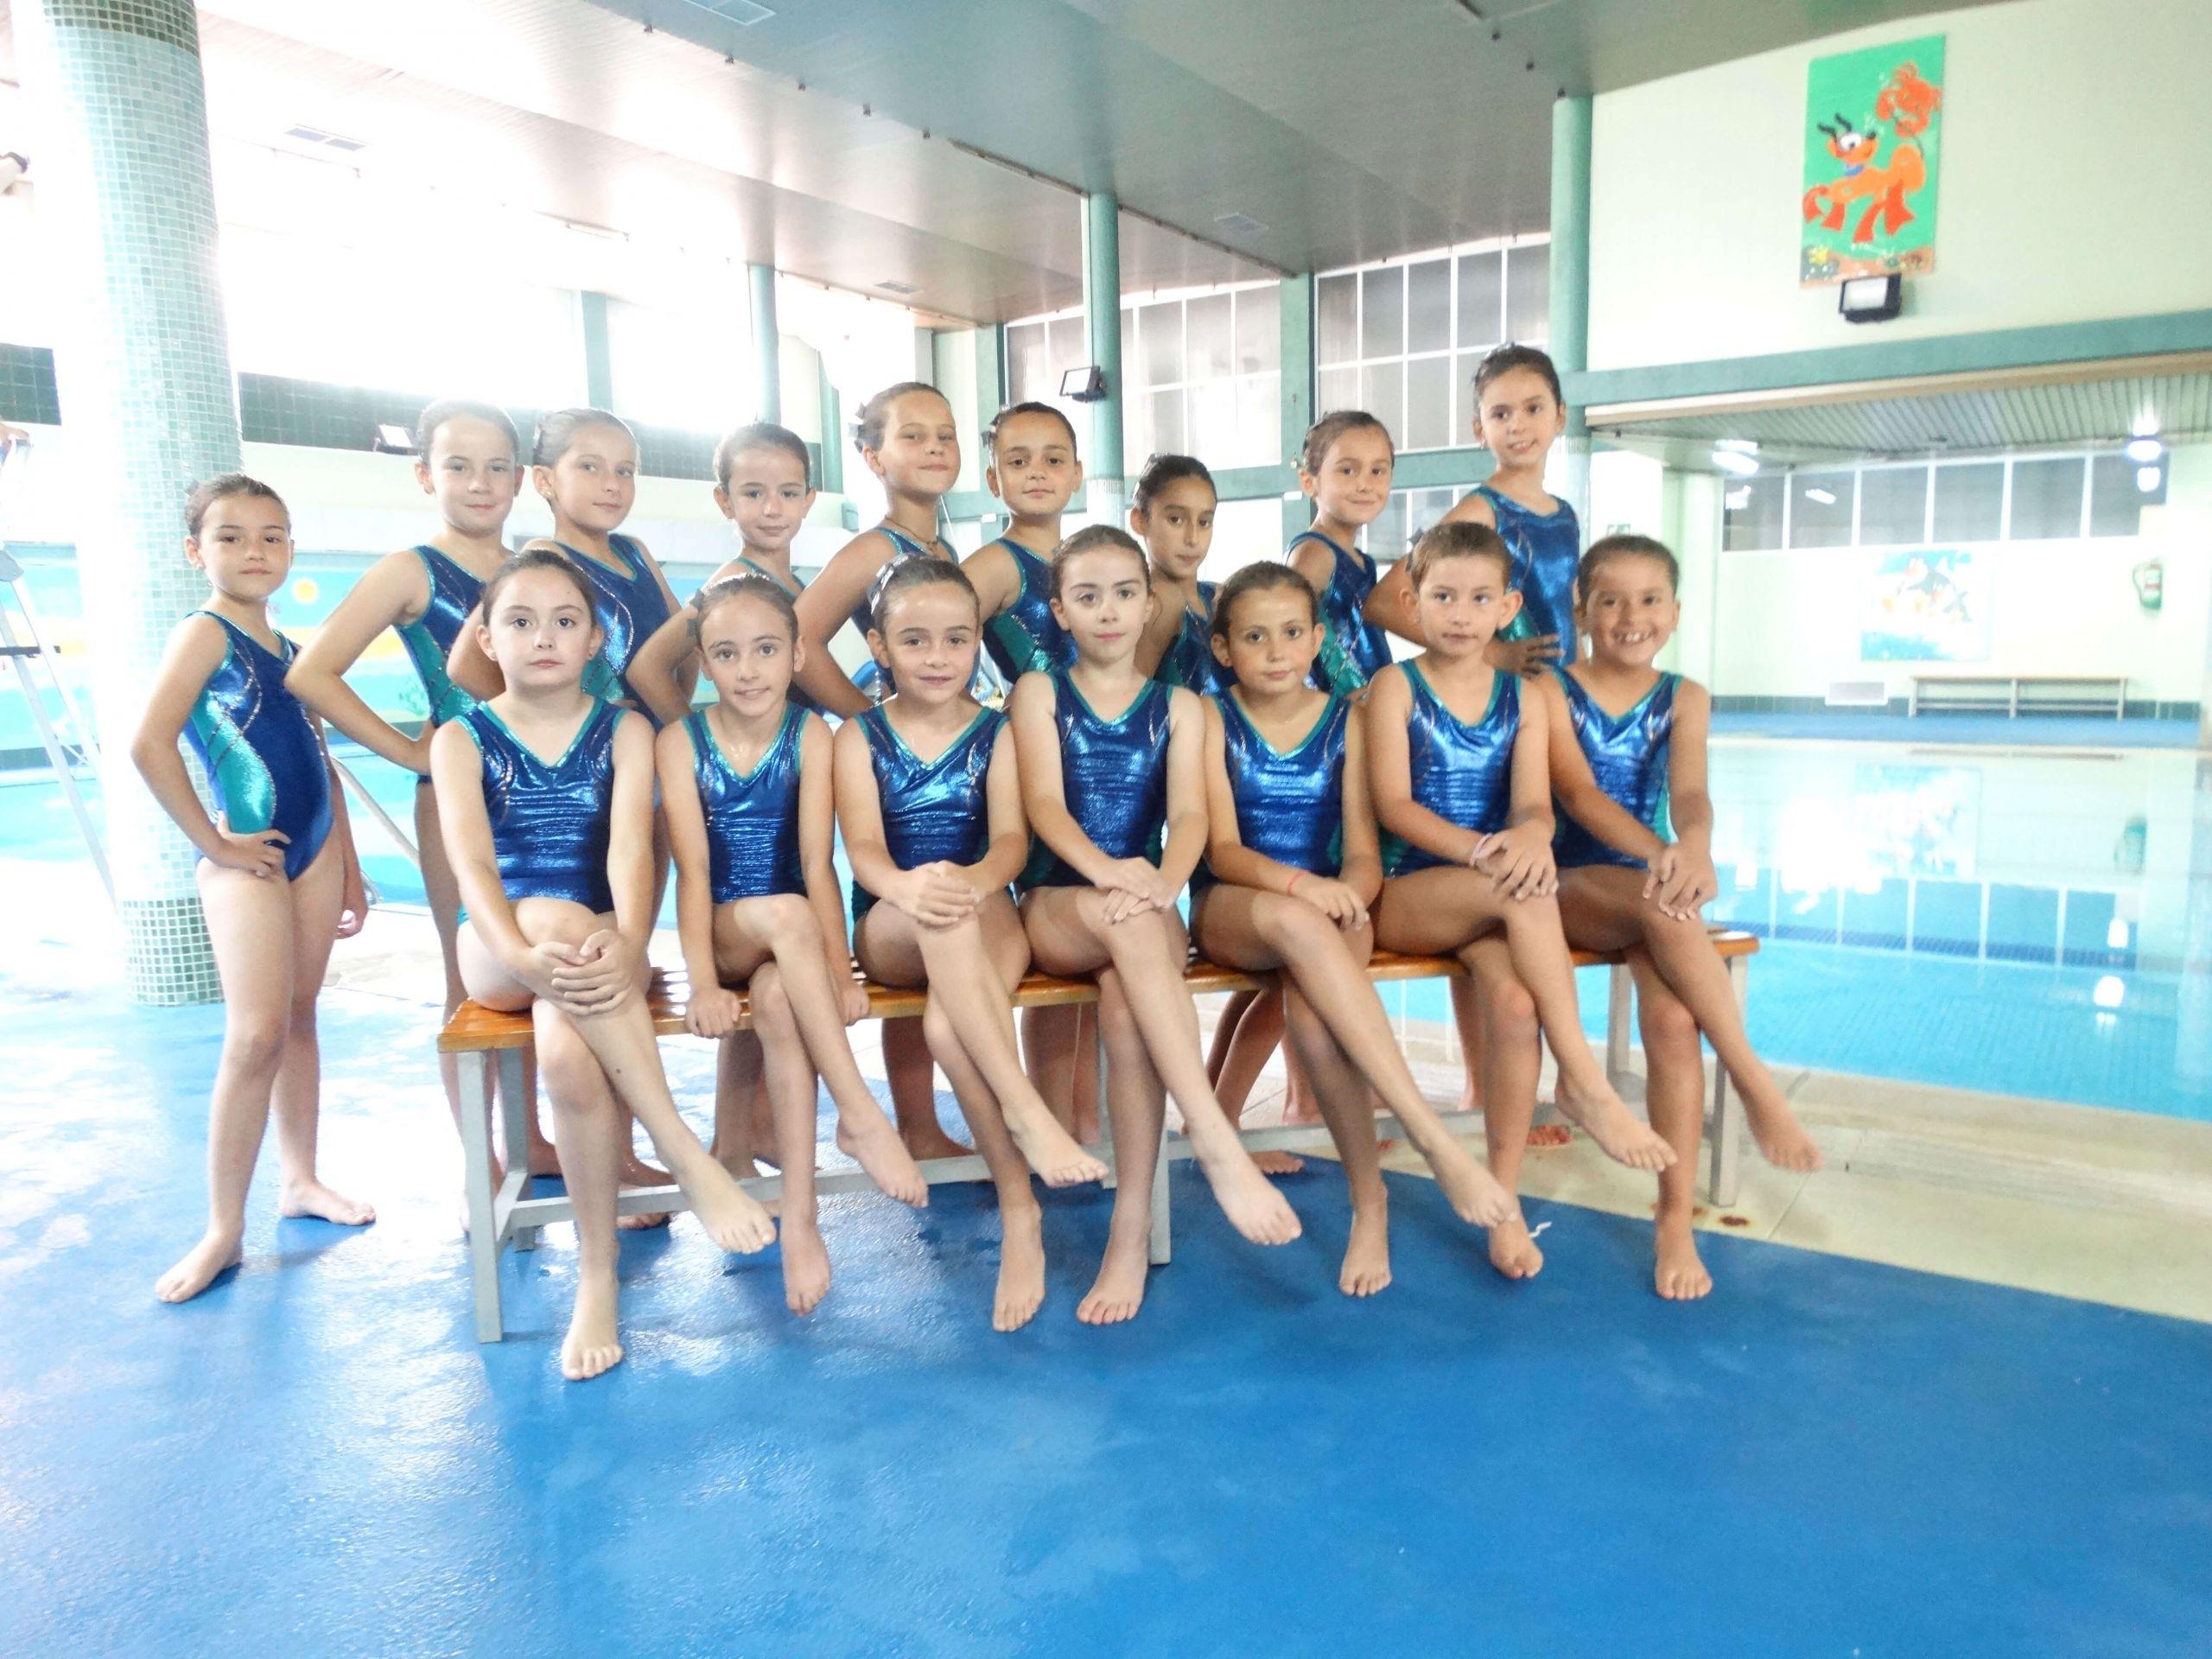 Equipo femenino de natación sincronizada